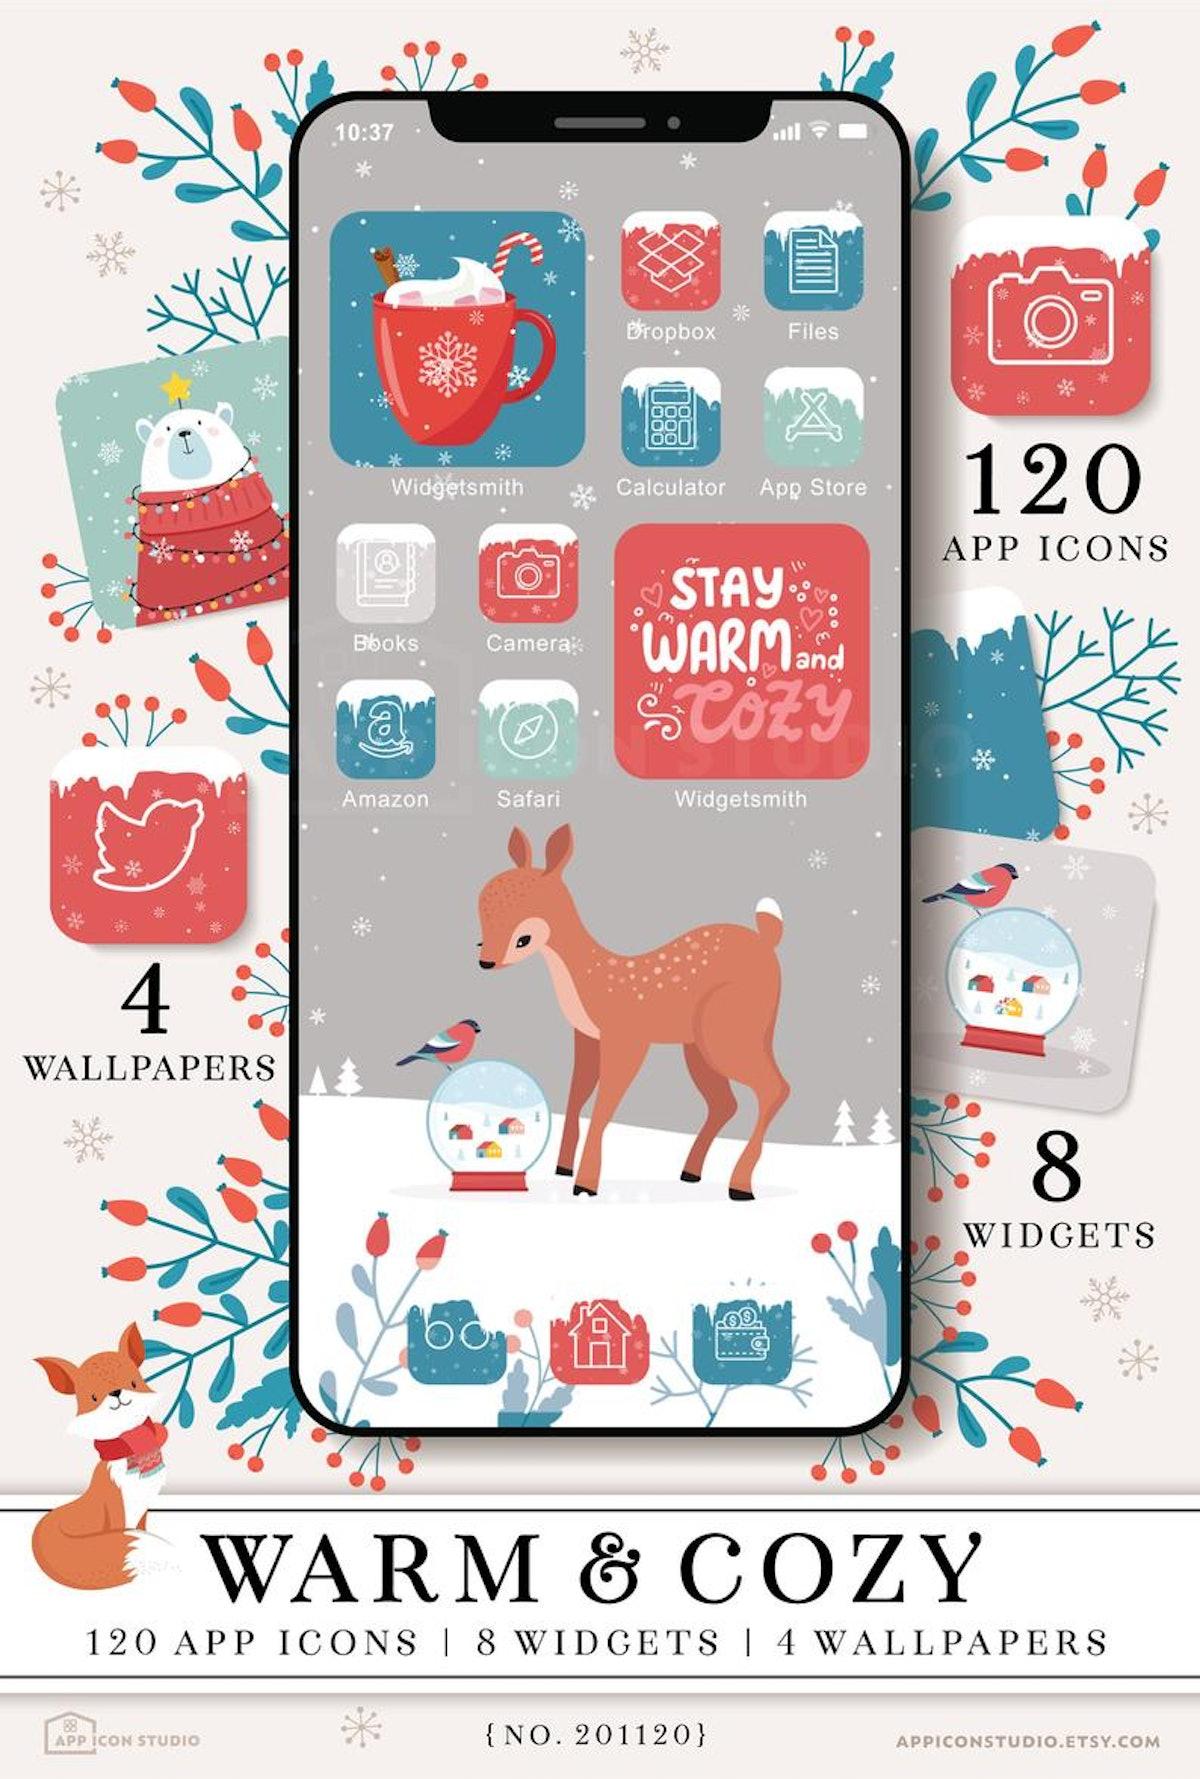 Cute Aesthetic Winter iOS 14 Home Screen Design